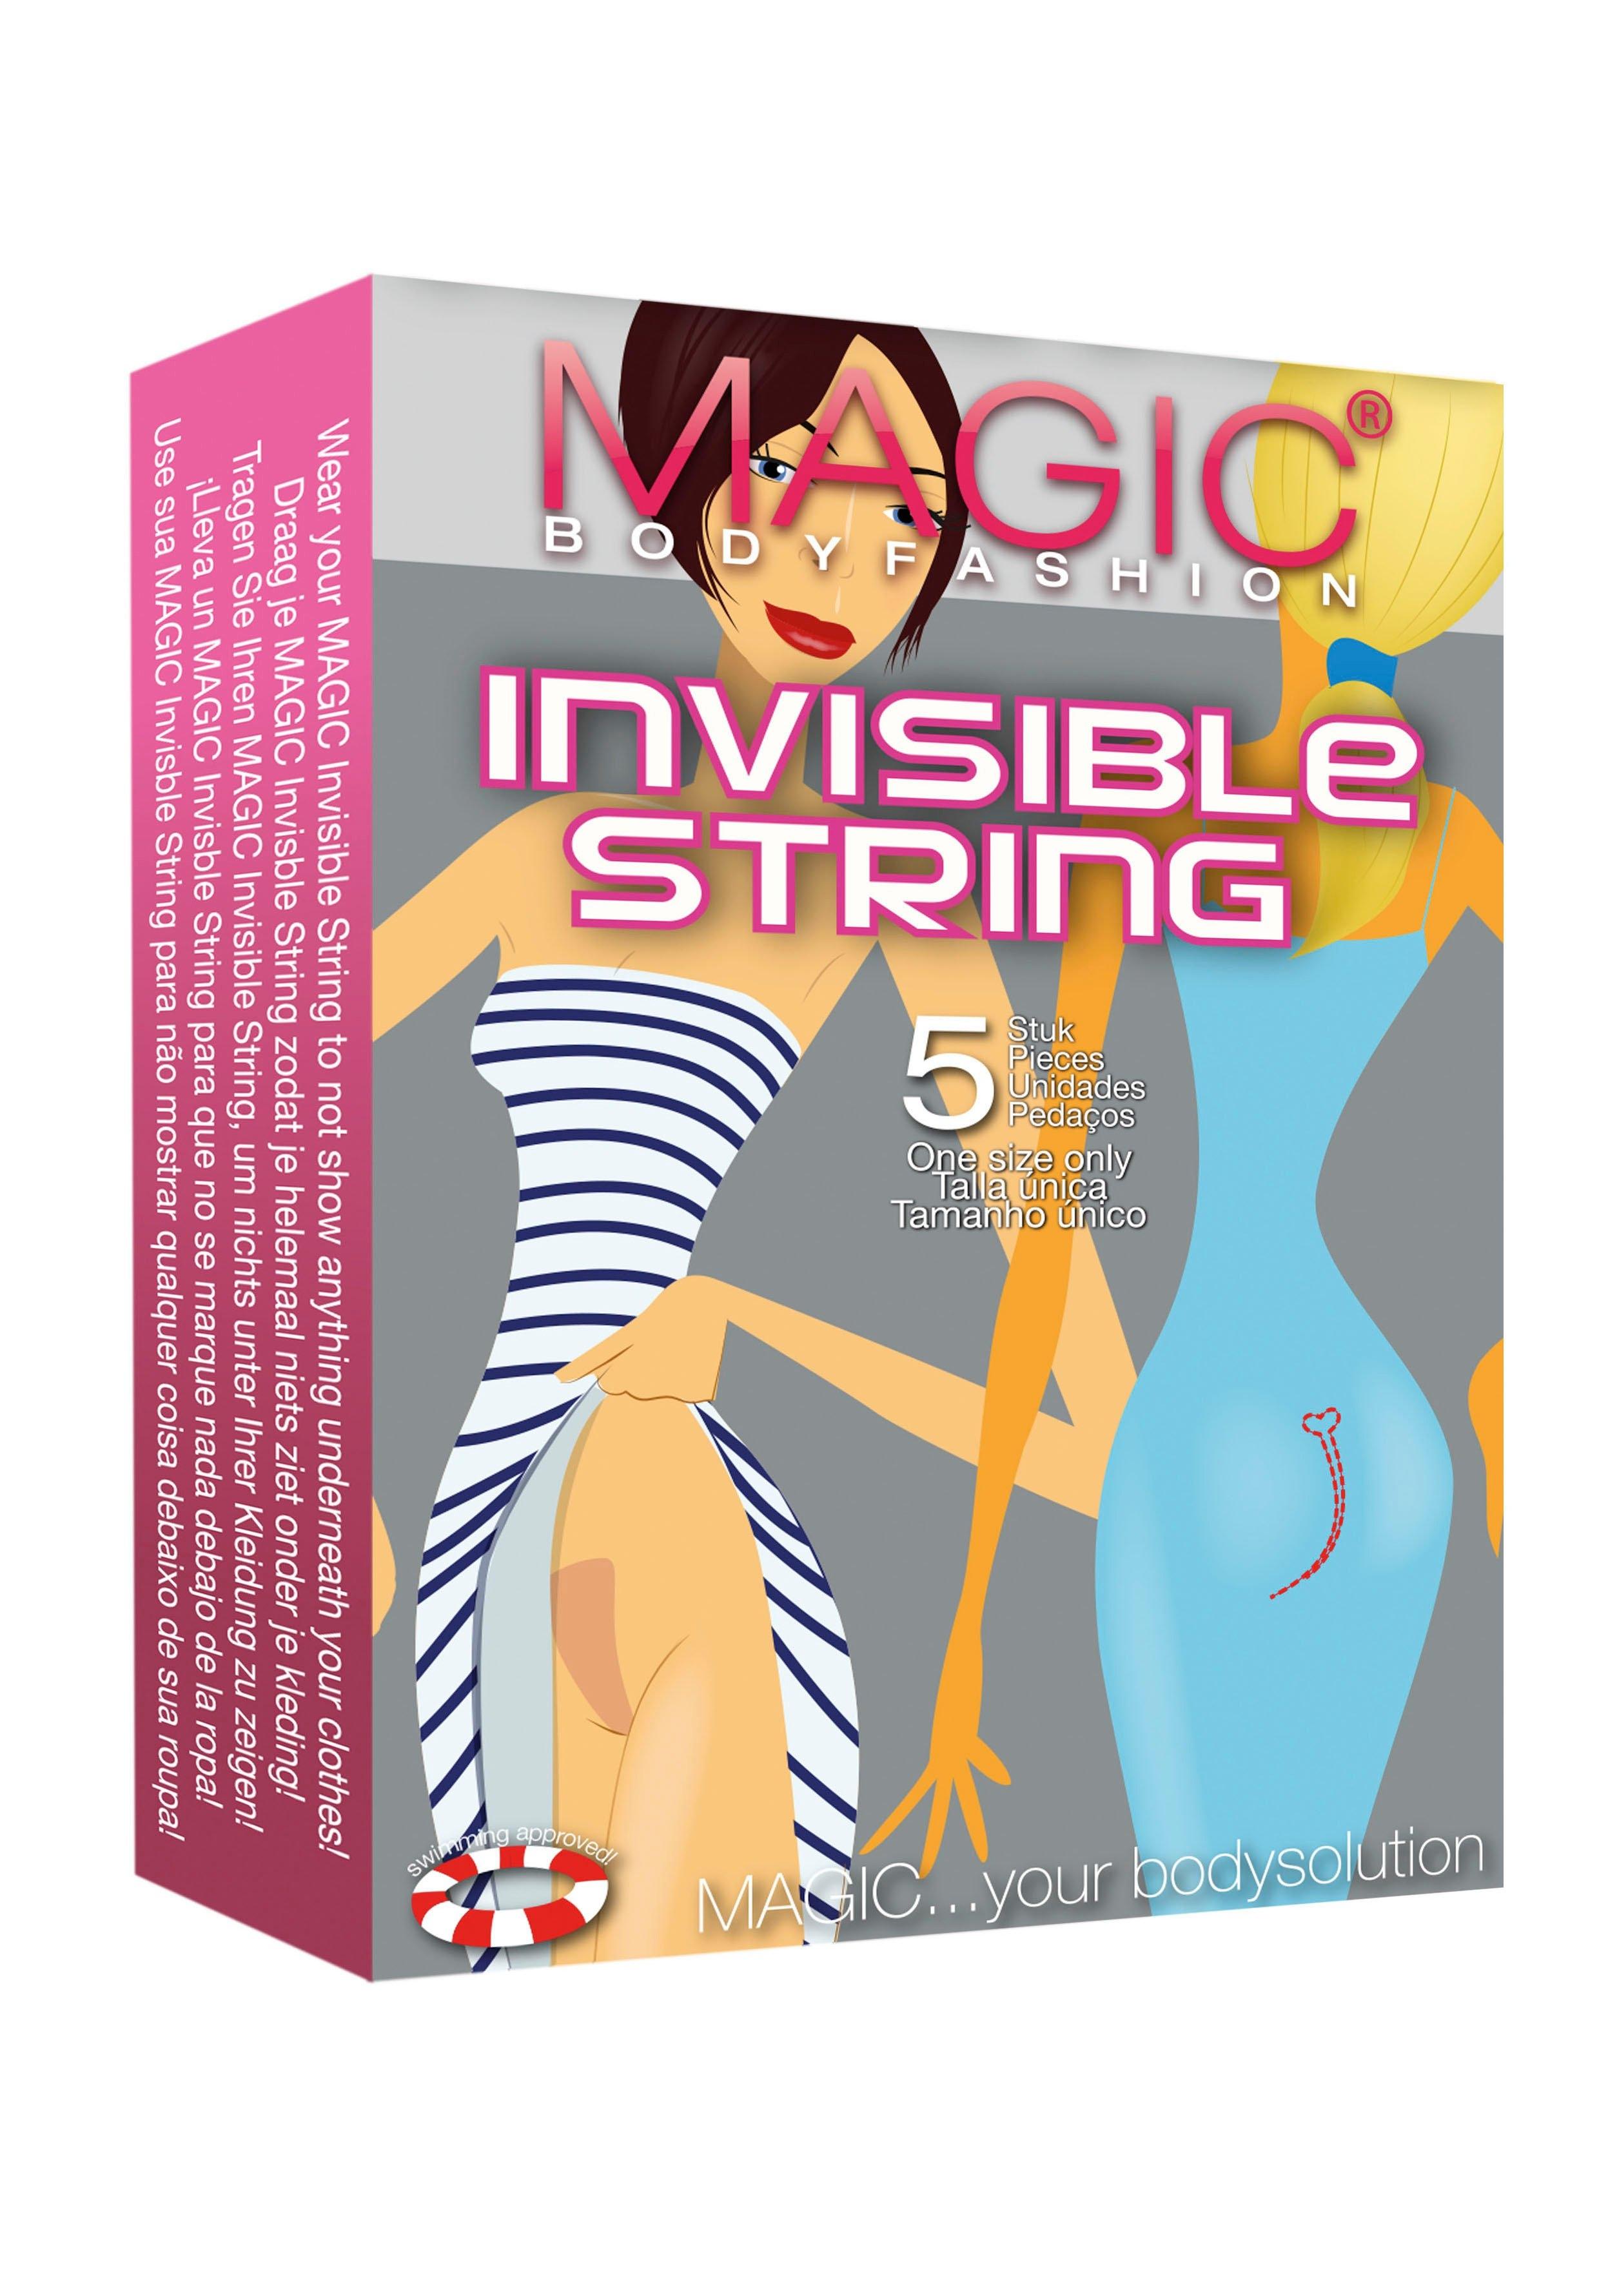 MAGIC Bodyfashion string »Invisible String« bij Lascana online kopen